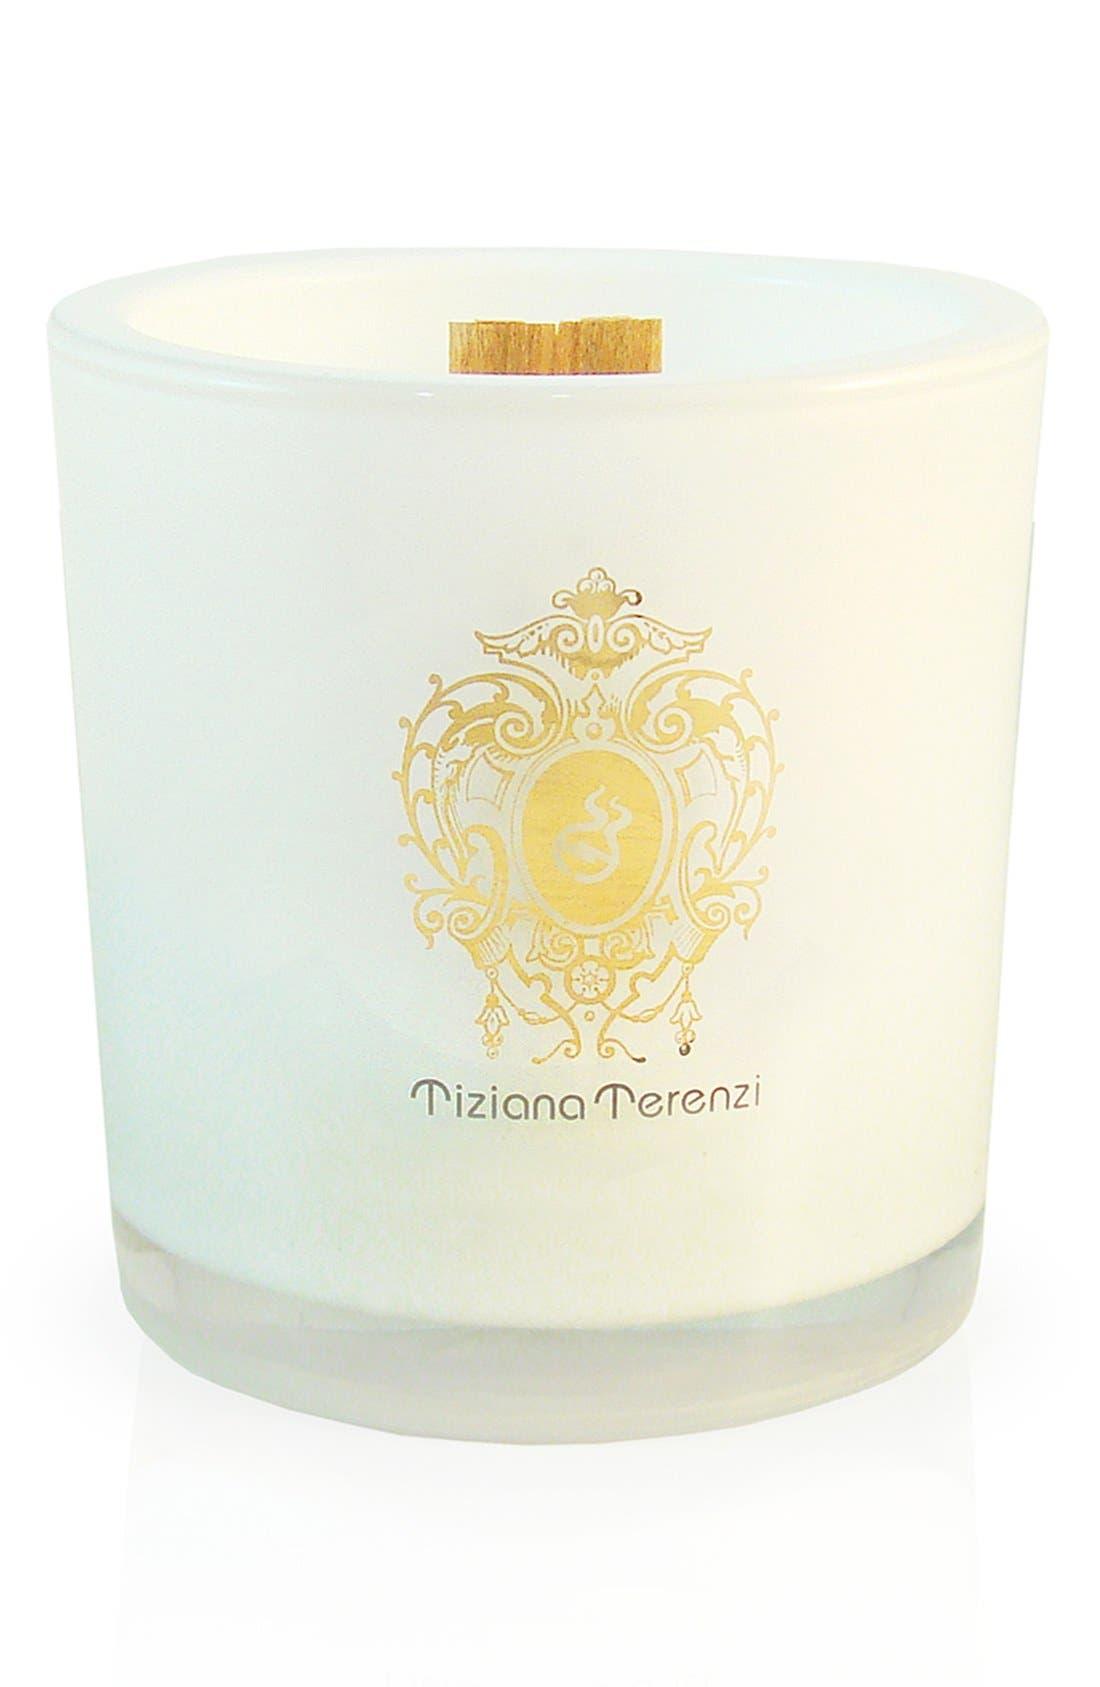 Alternate Image 1 Selected - Tiziana Terenzi 'Arethusa' Two-Wick Foco Candle